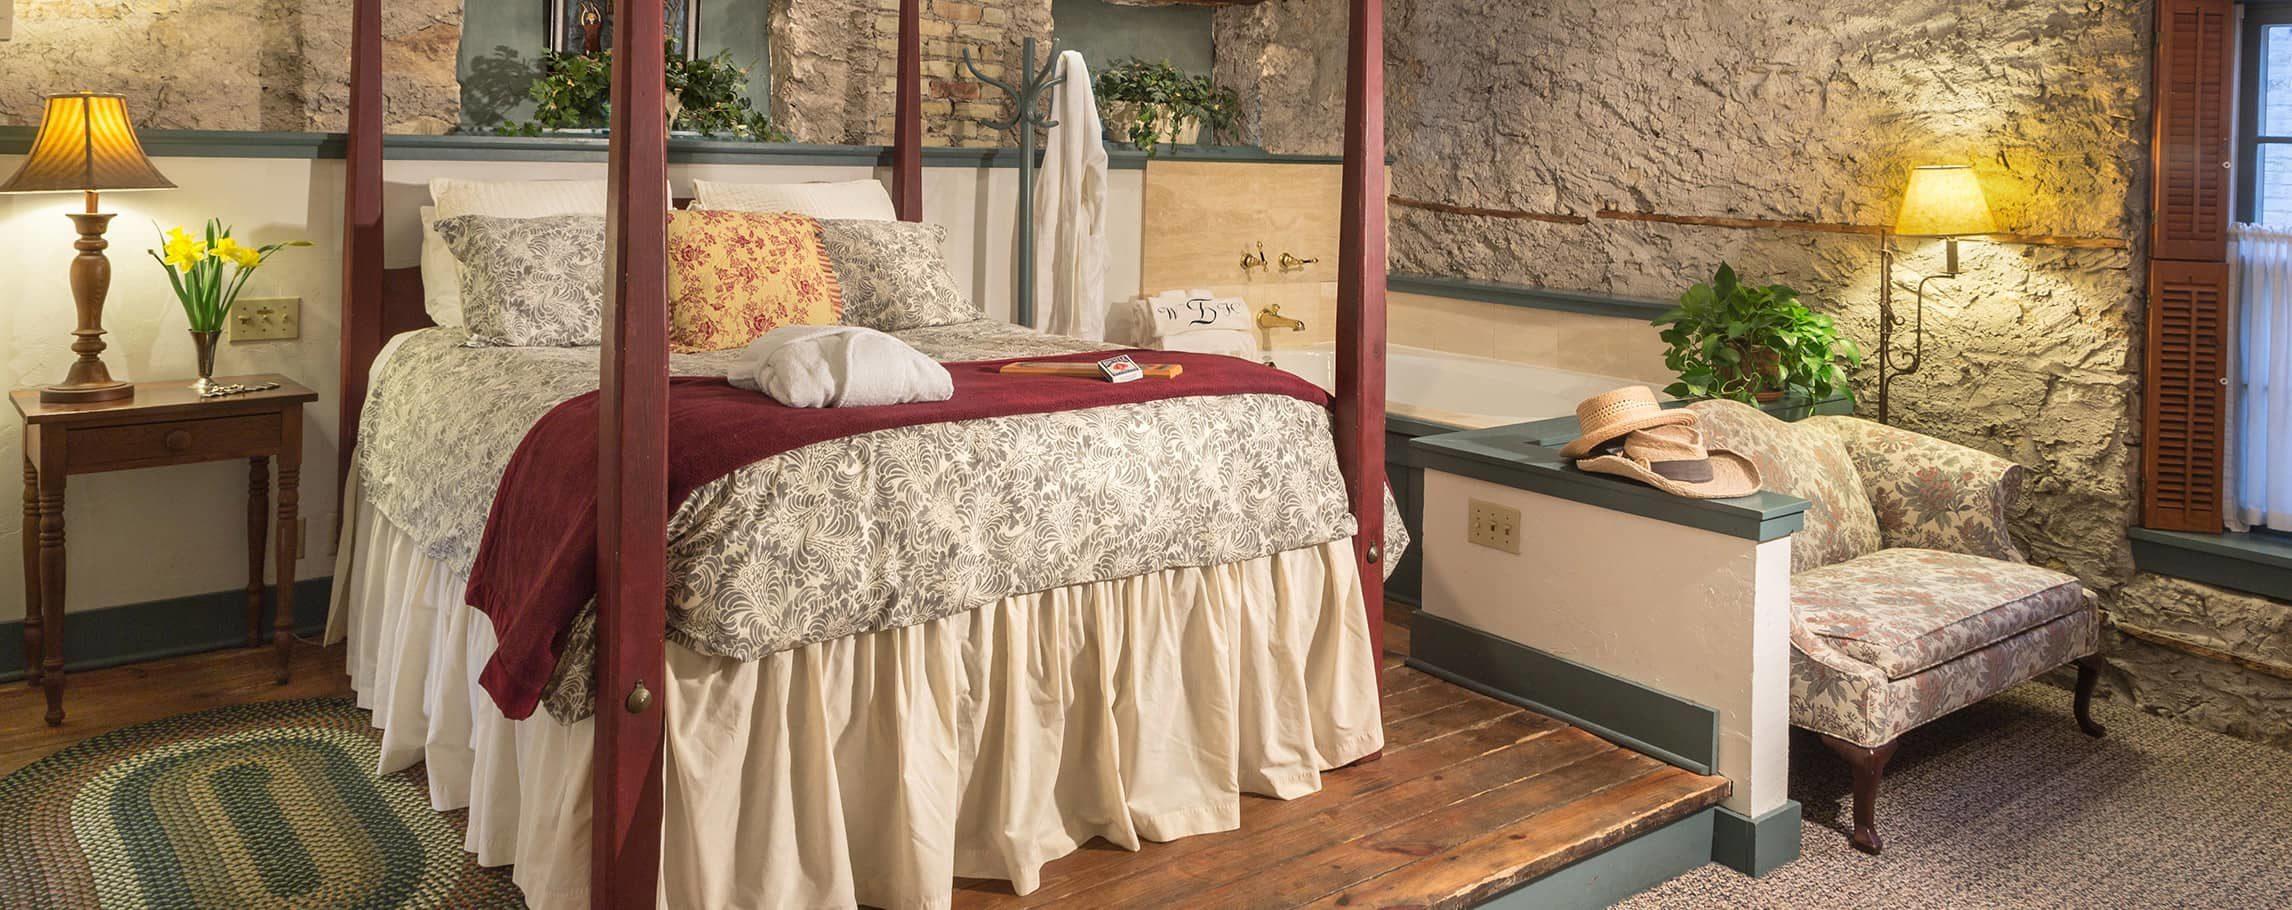 John Roth room bed